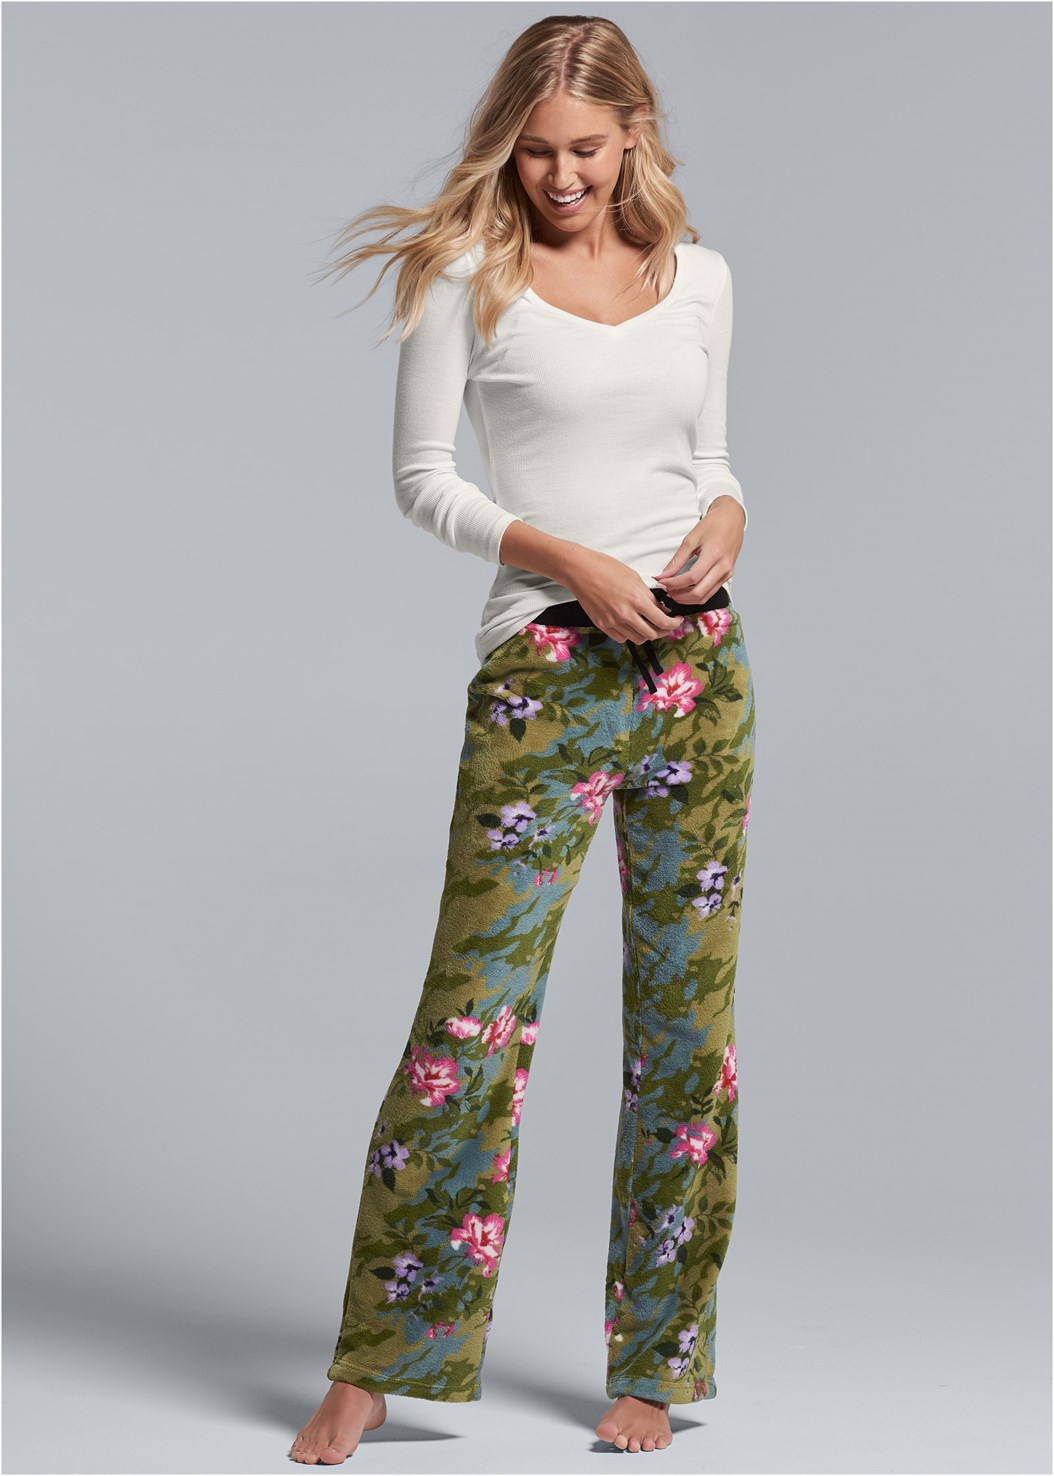 Wooby Plush Pants